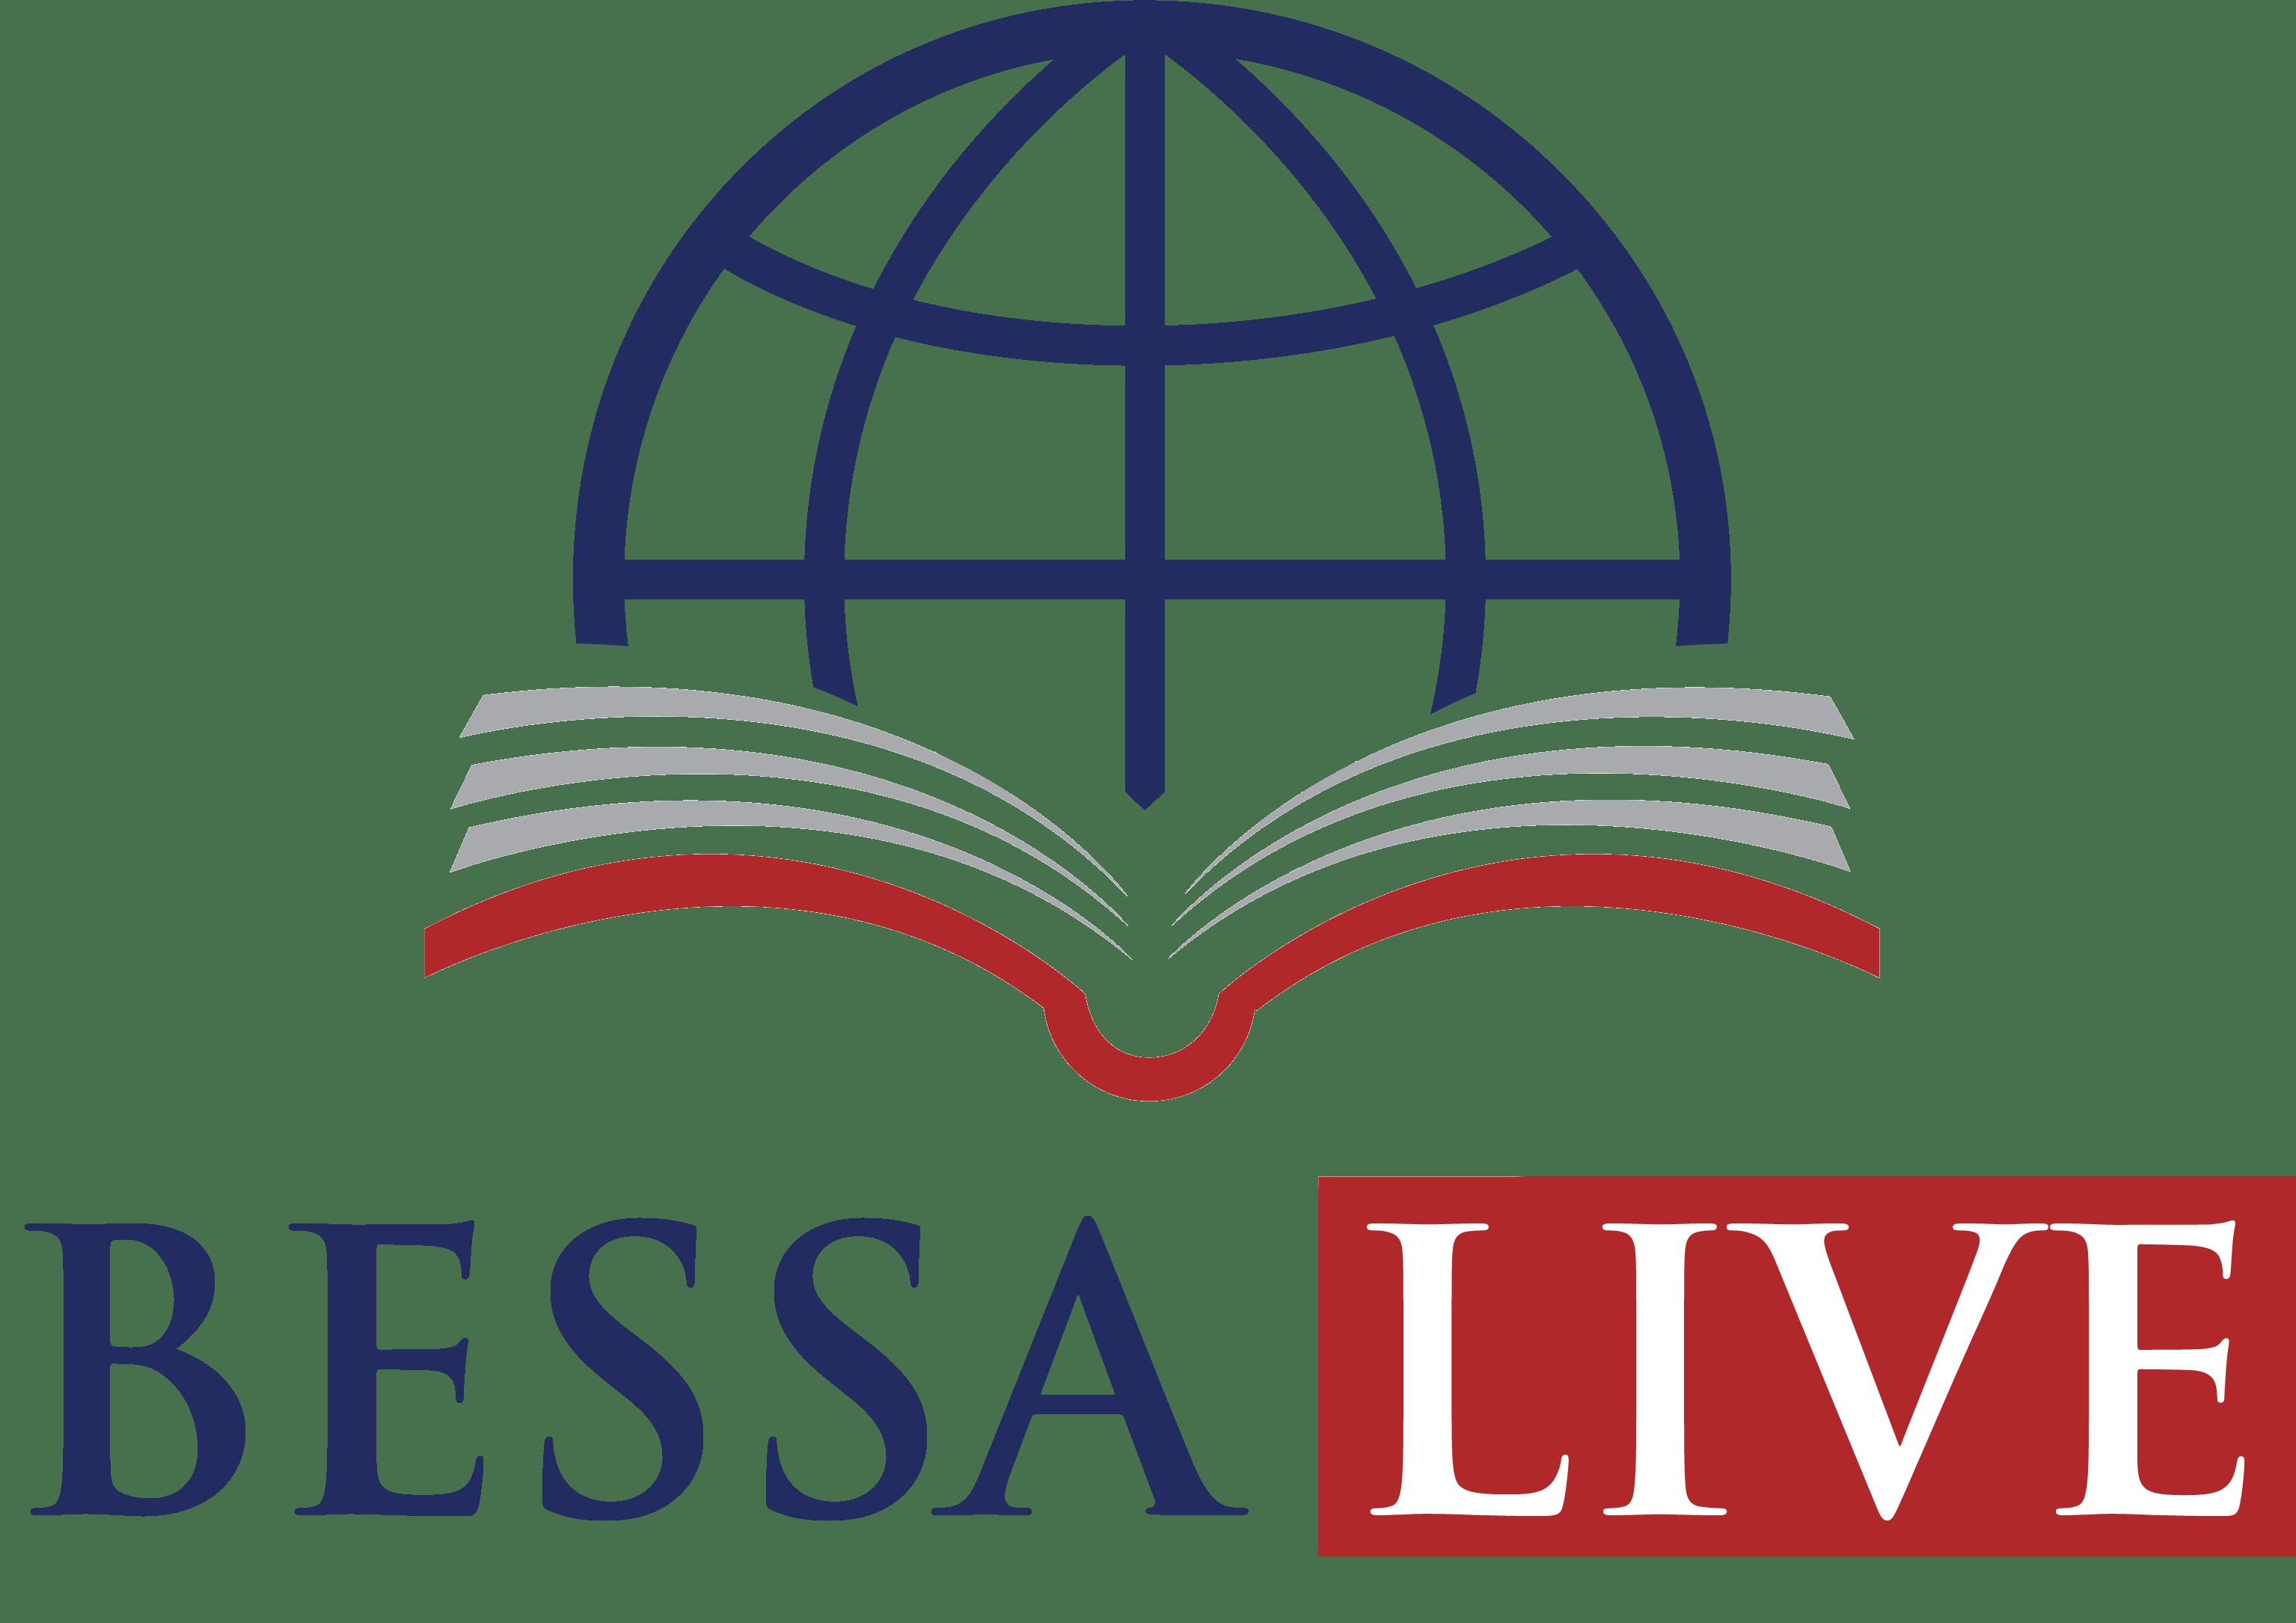 Bessa Live Logo